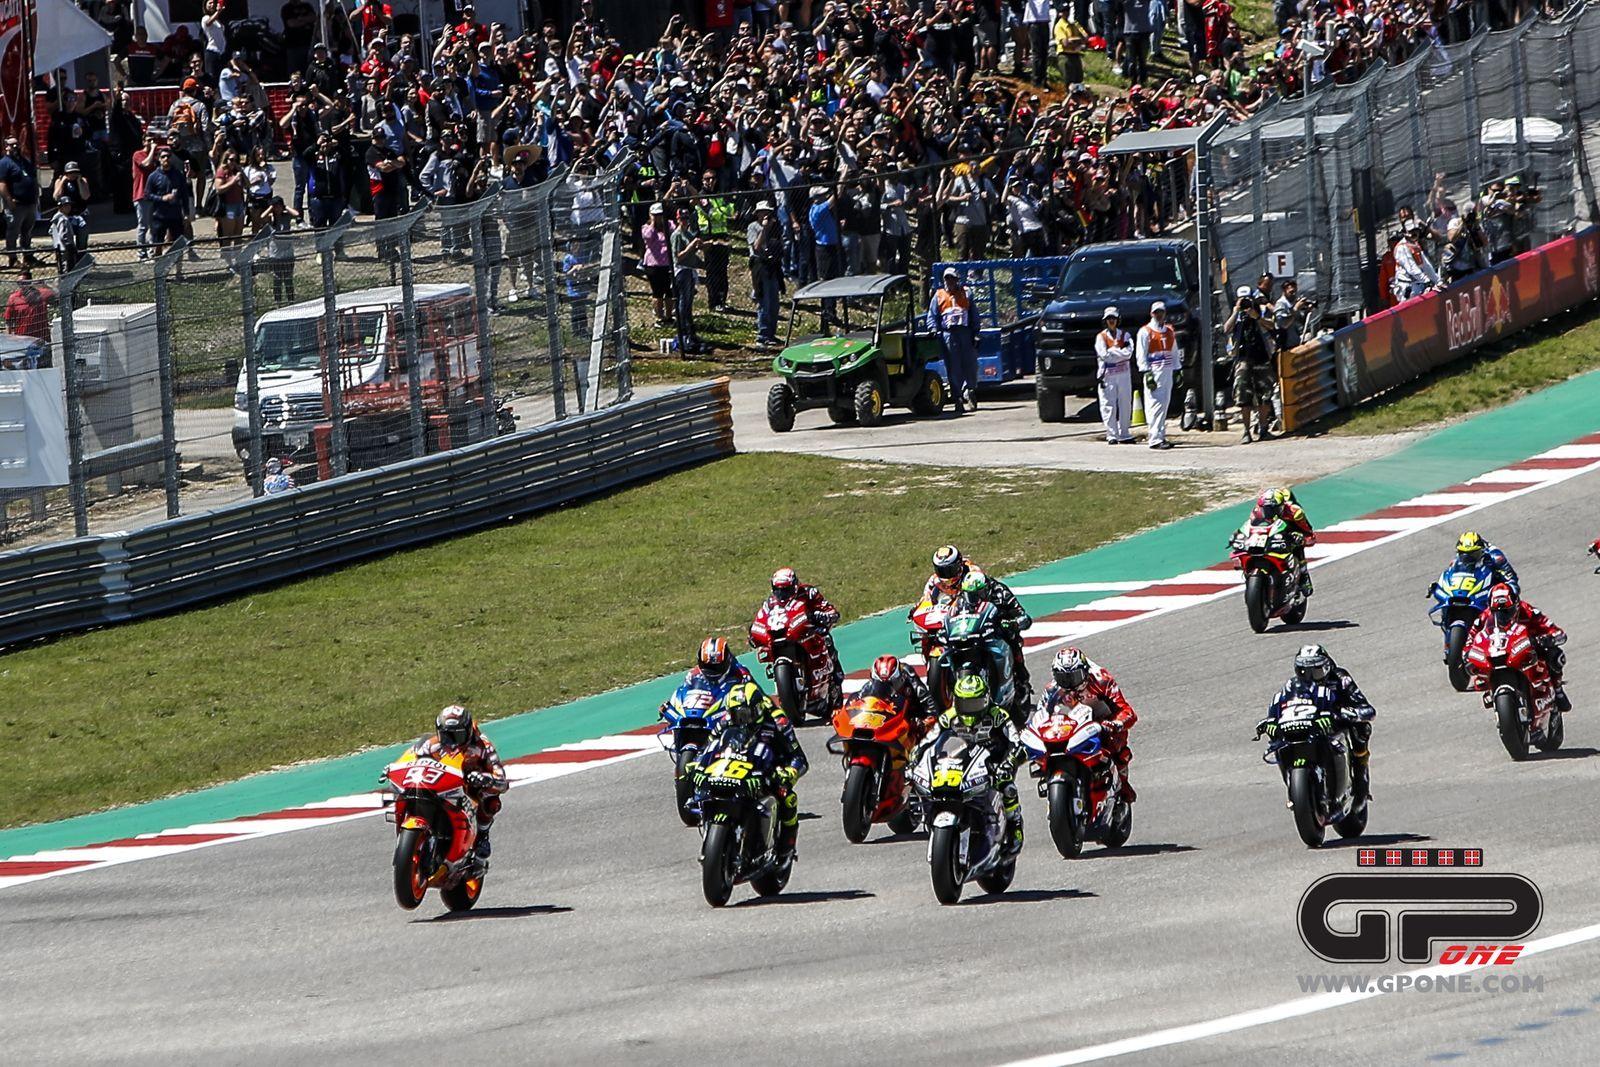 MotoGP, More time on TV during start procedure